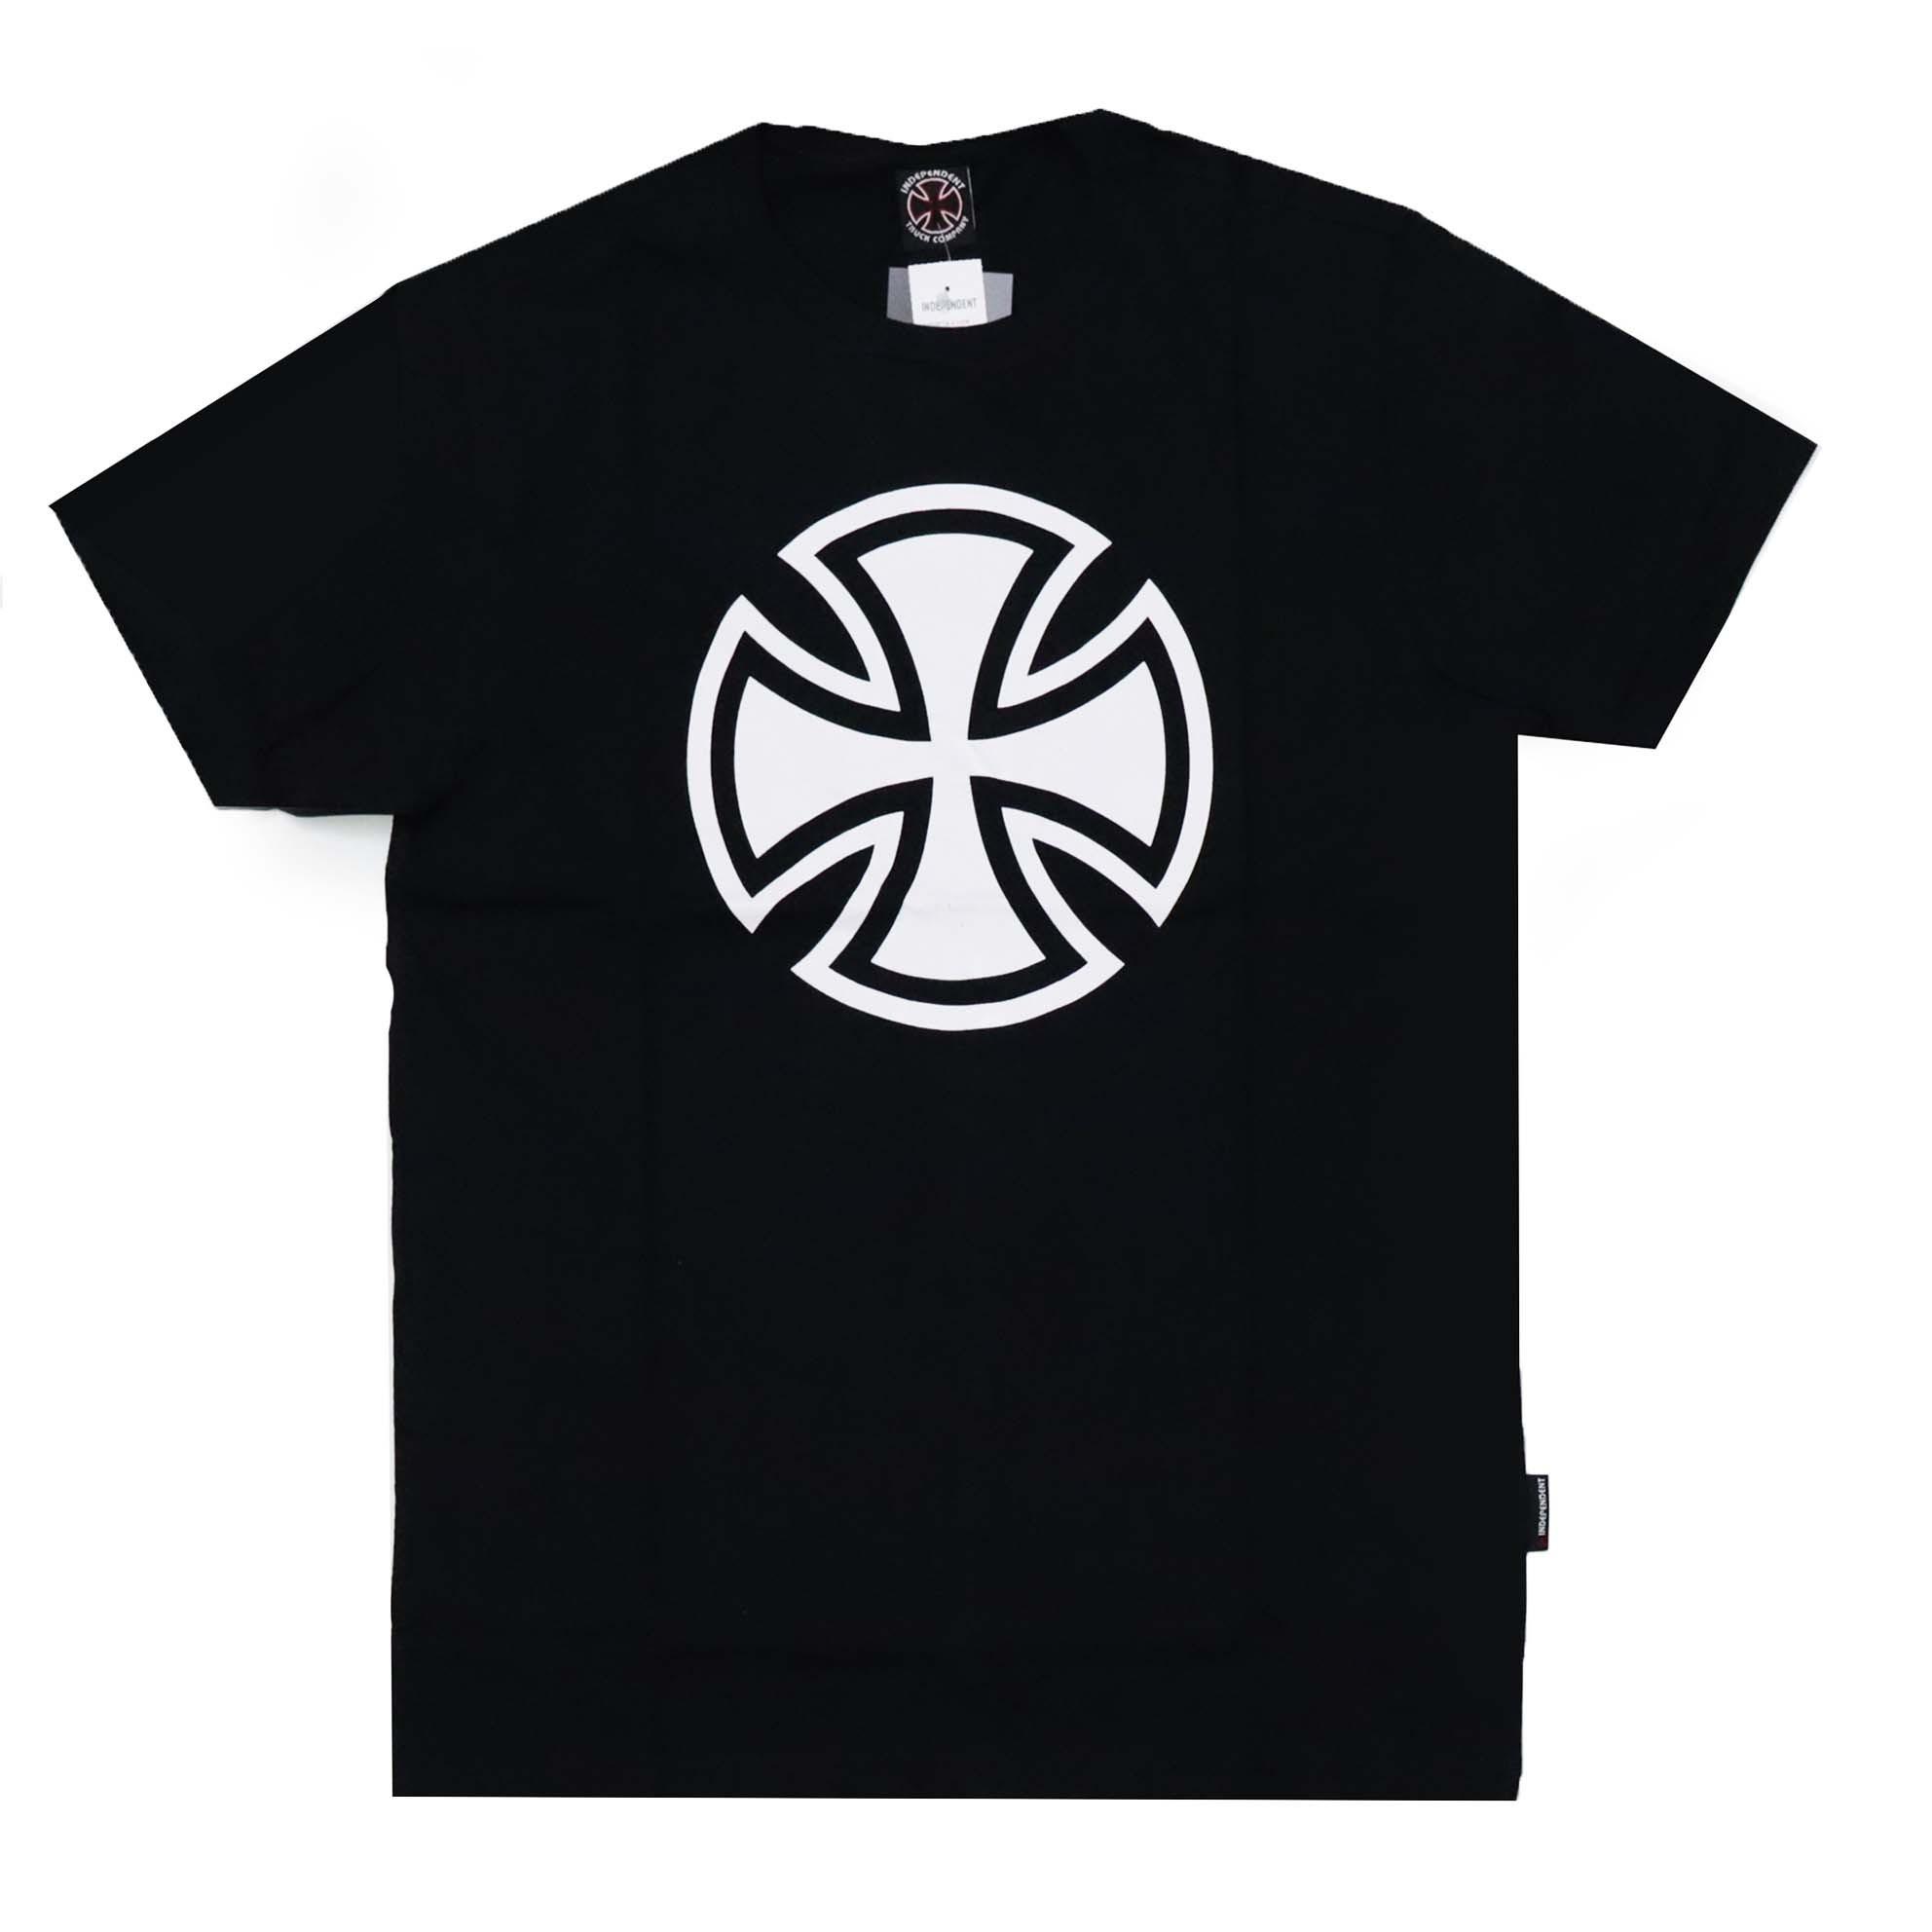 Camiseta Independent 3 Tier Cross 1 Color - Preto